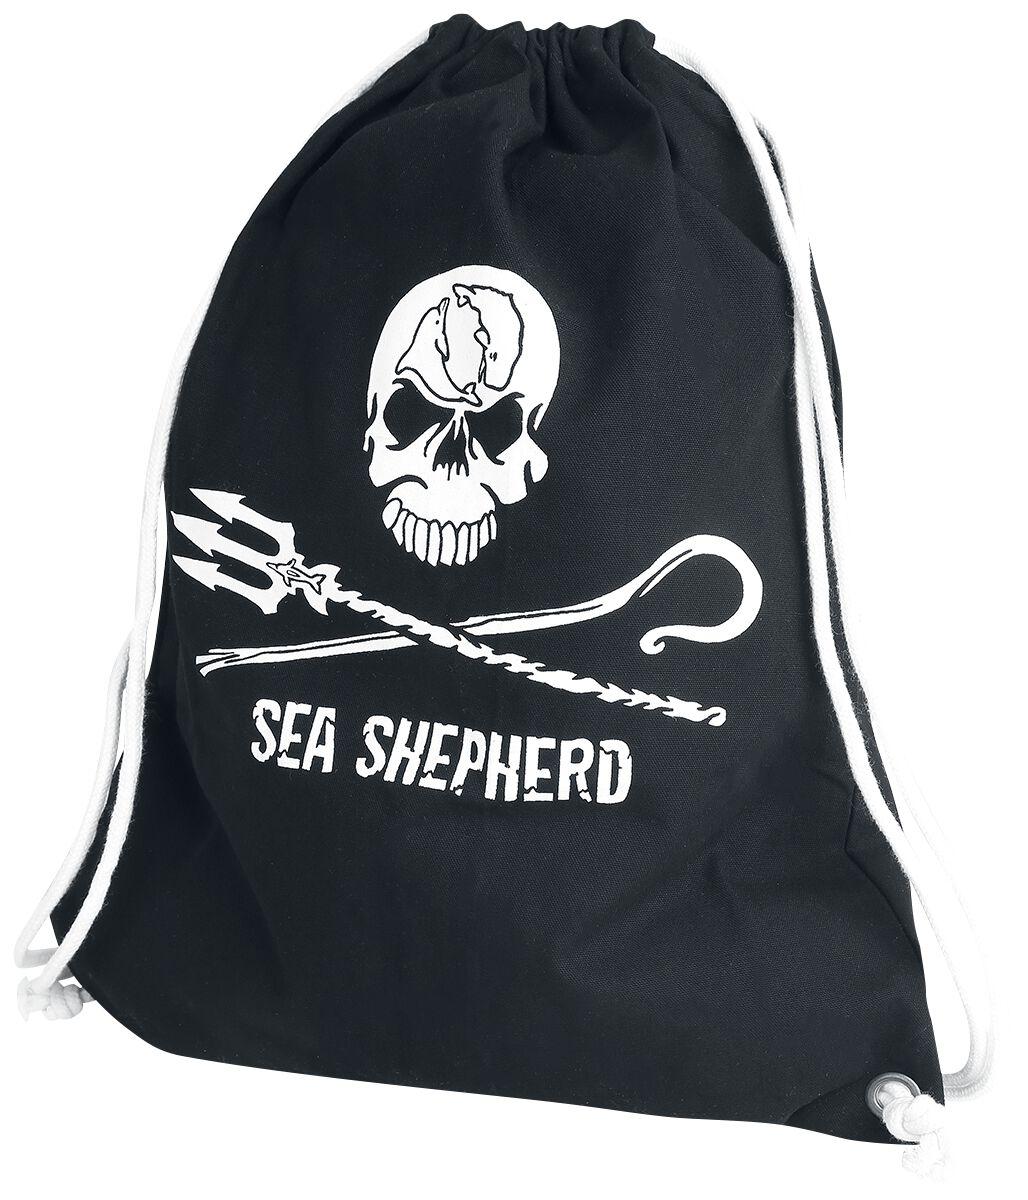 Rucksaecke - Sea Shepherd Jolly Roger Turnbeutel schwarz  - Onlineshop EMP